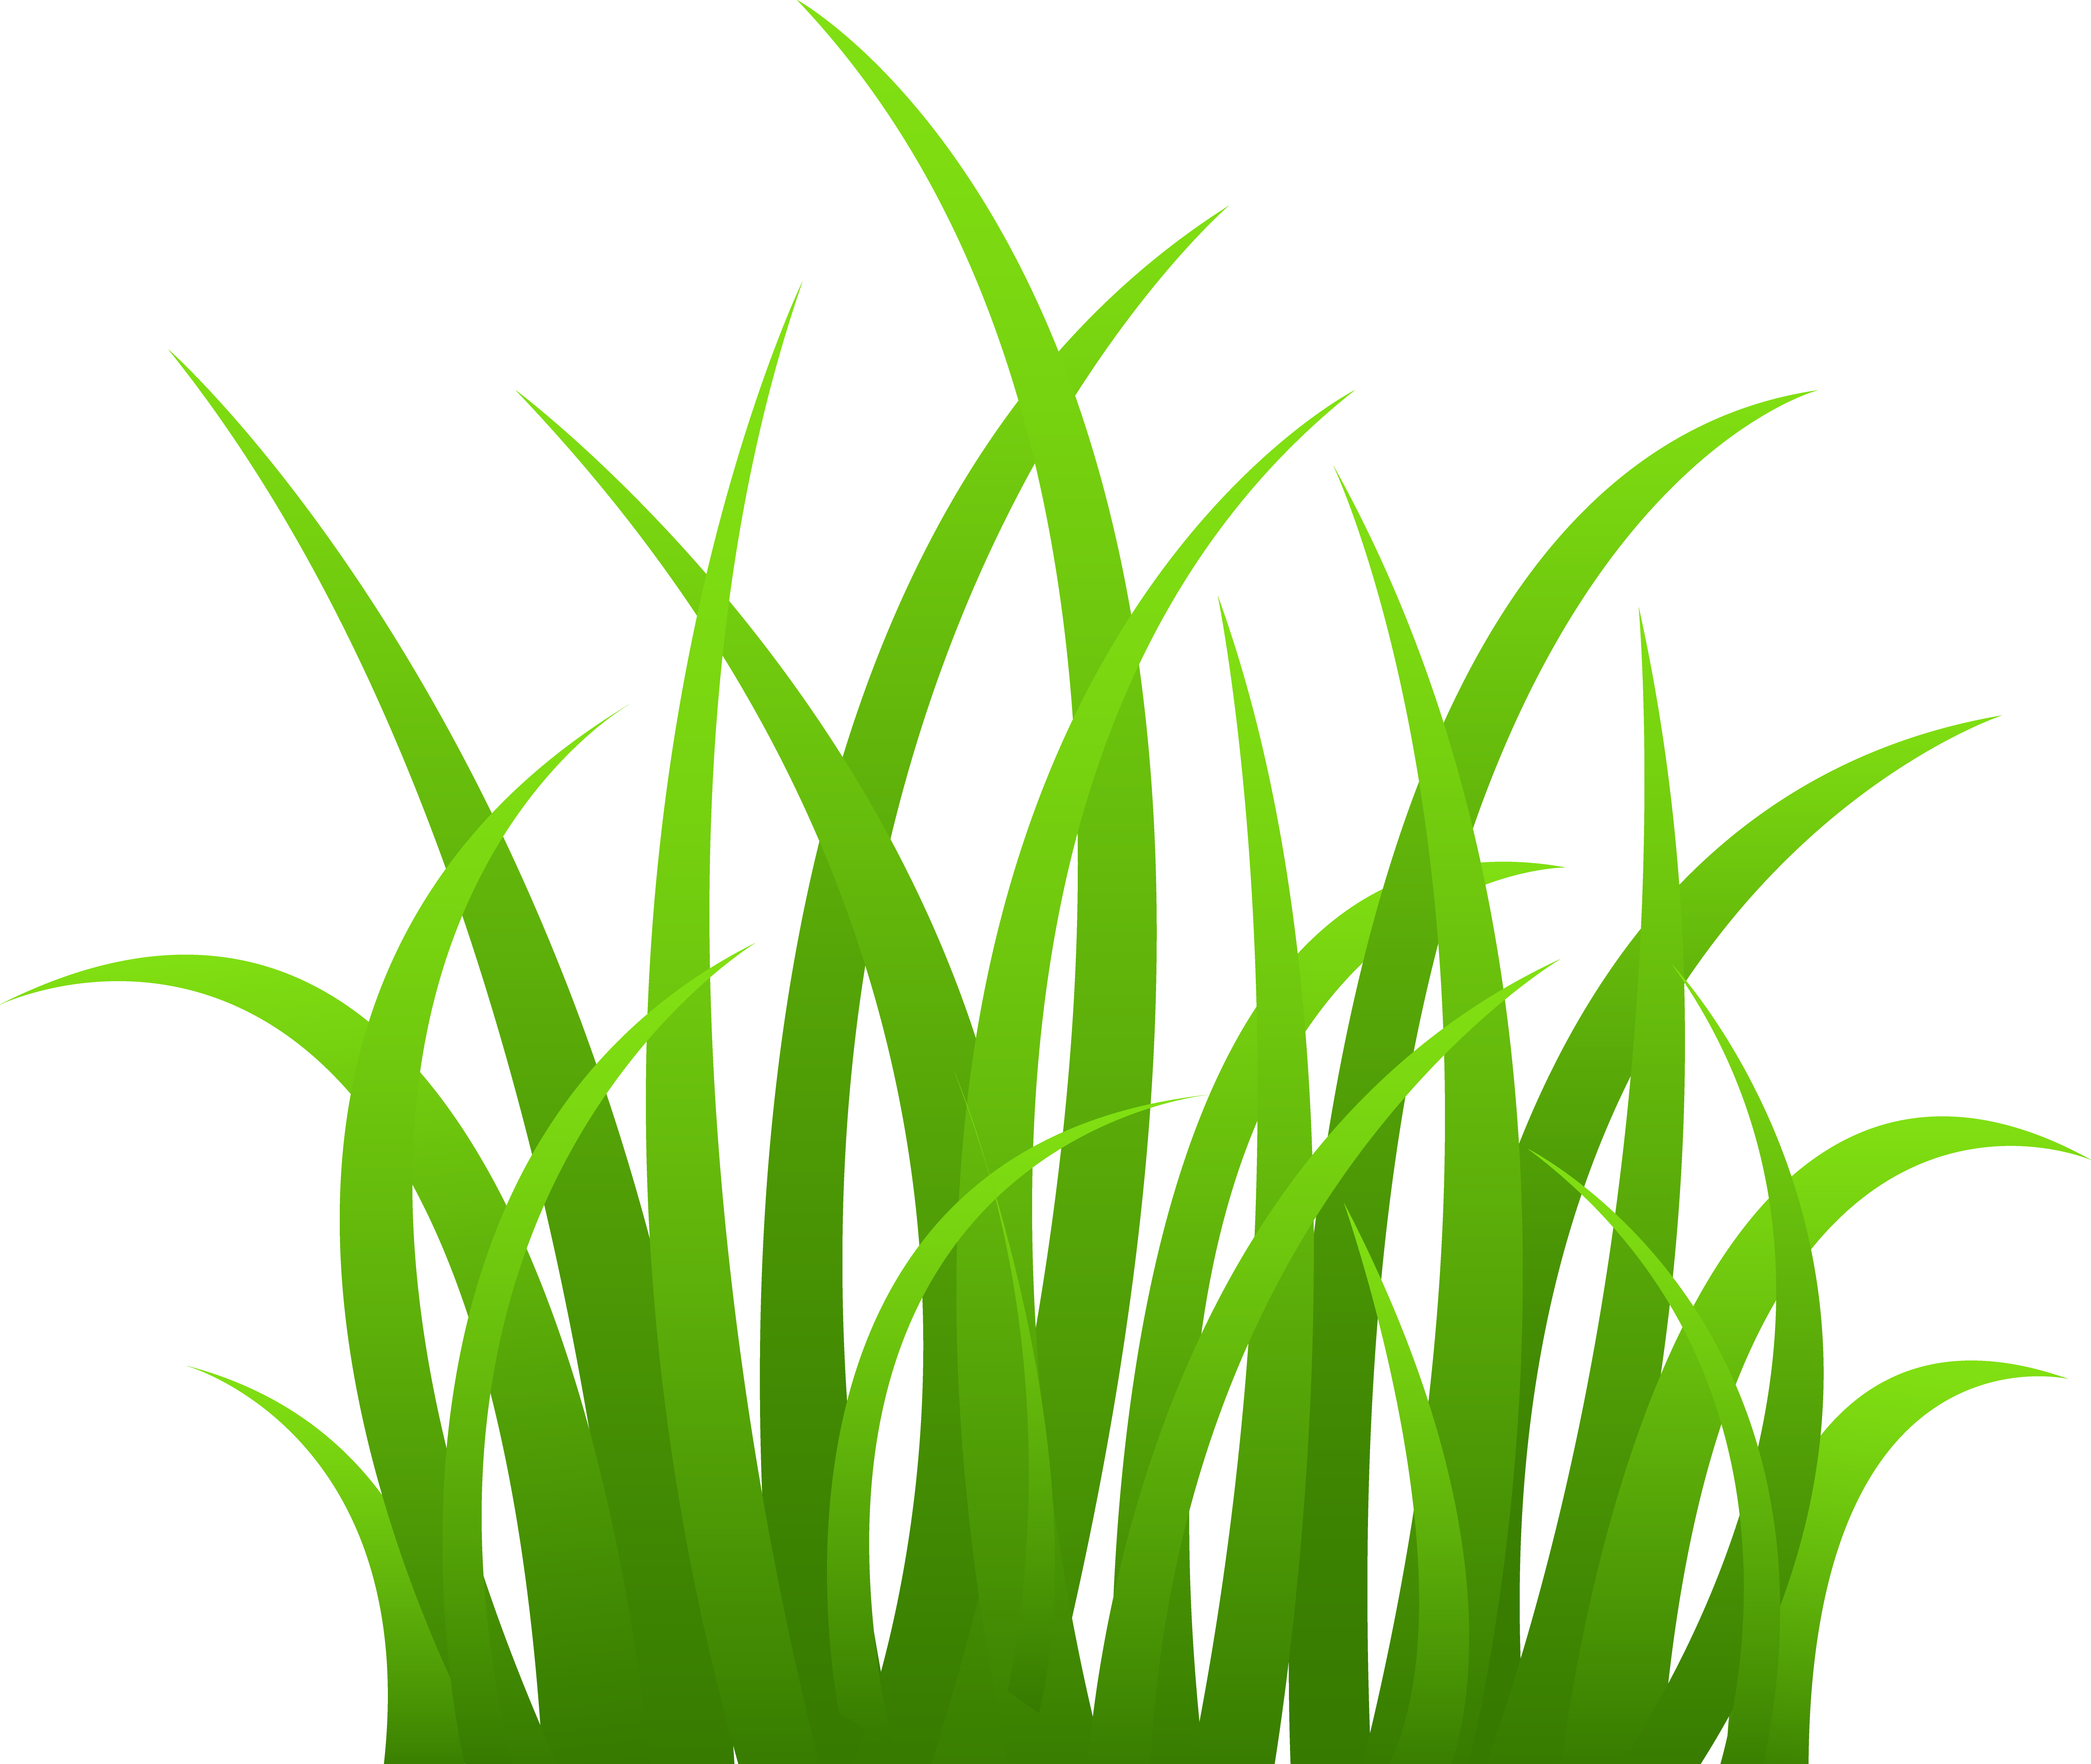 Grass clipart transparent background.